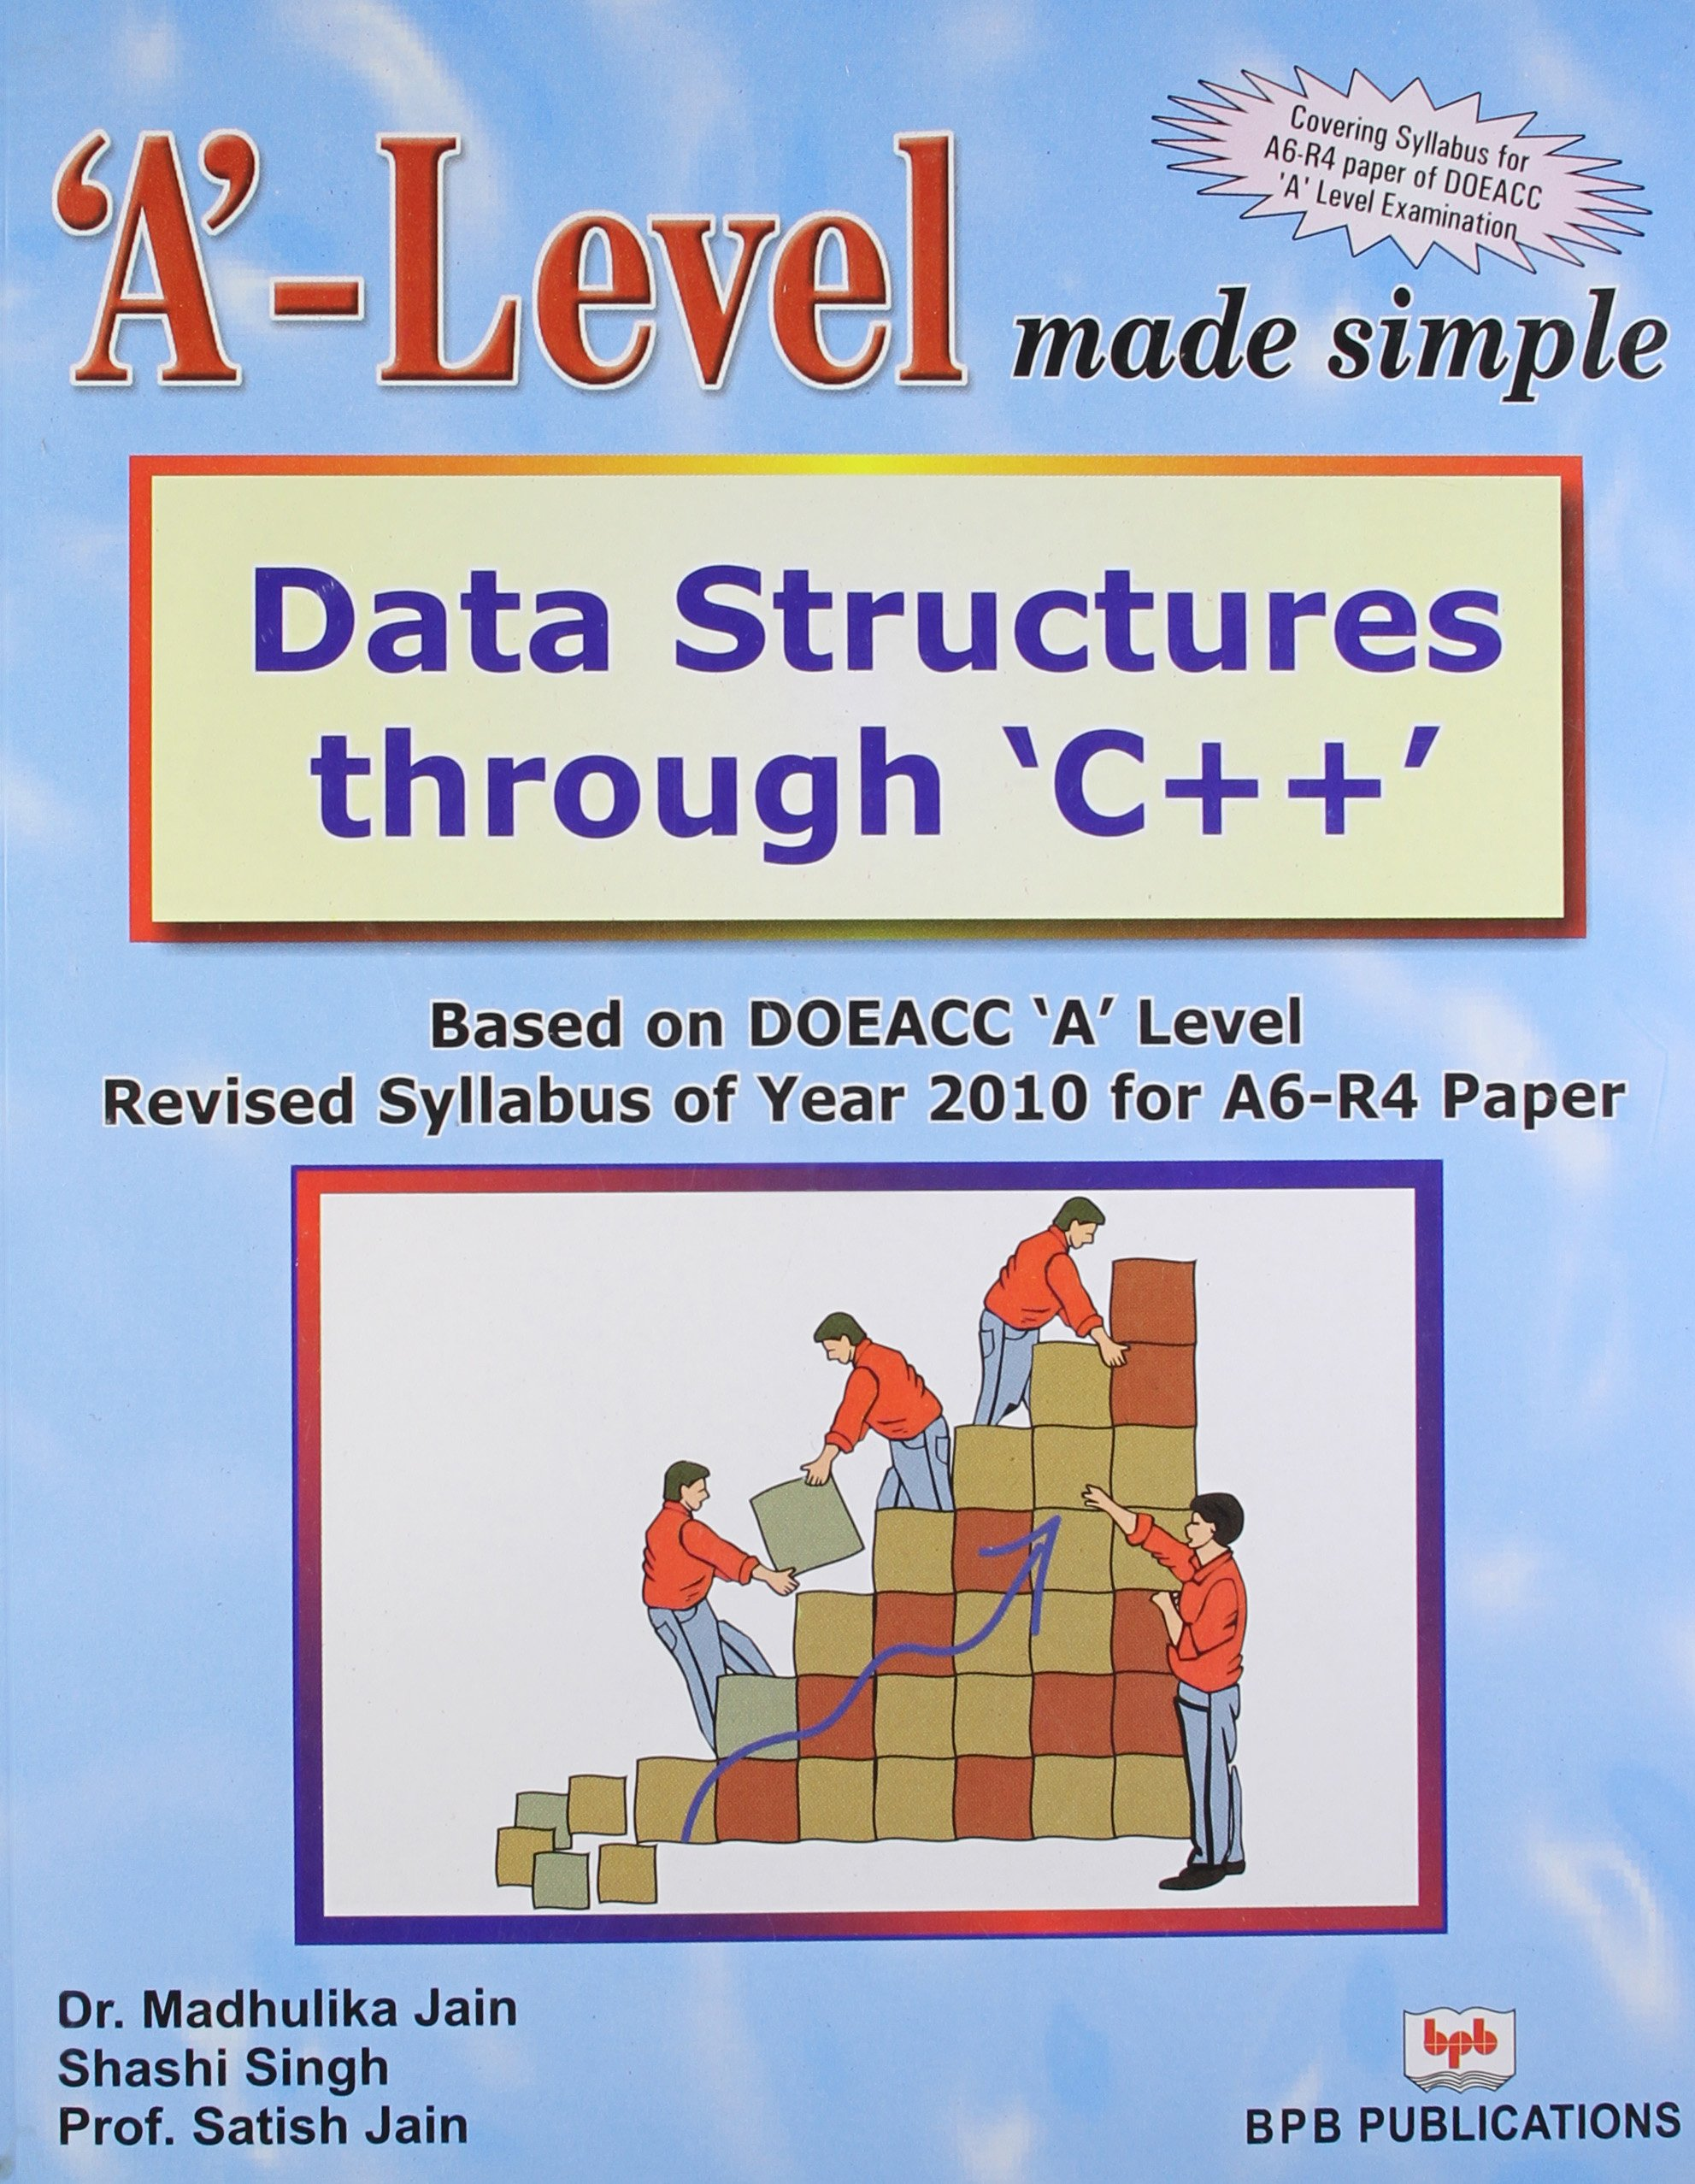 Pdf data kanetkar structure c++ through